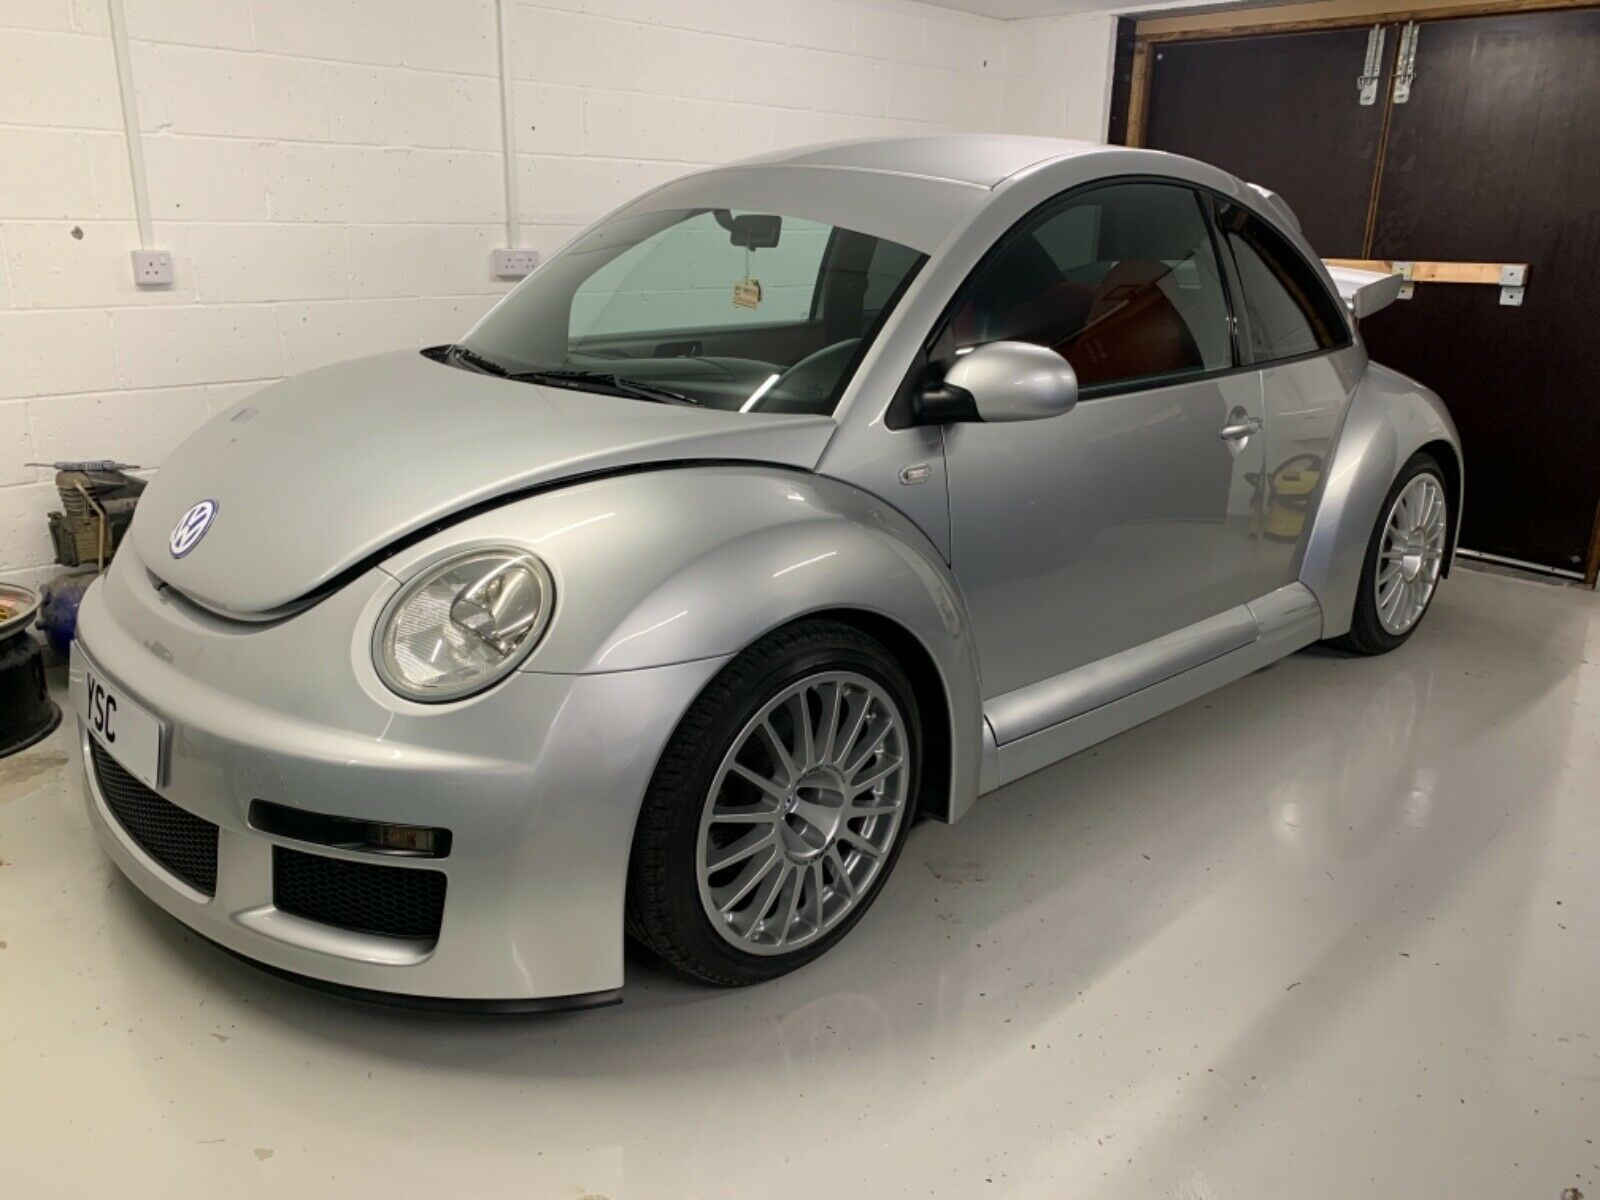 Volkswagen-Beetle-RSi-for-sale-5